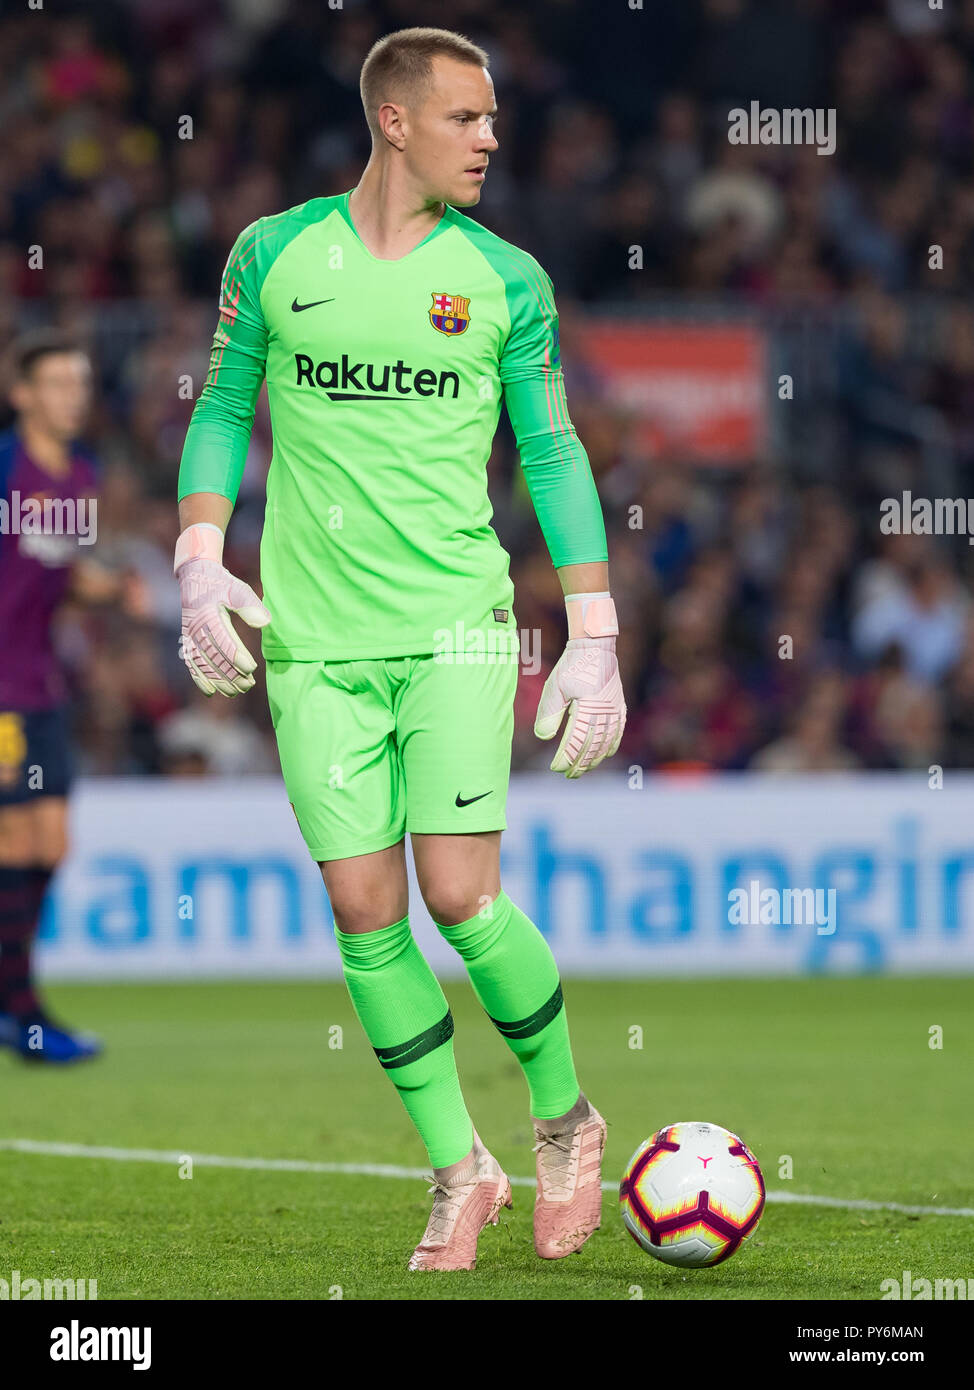 October 20th; Marc-Andre ter Stegen of FC Barcelona during the 2018/2019 LaLiga Santander Round 8 game between FC Barcelona and Sevilla FC at Camp Nou - Stock Image